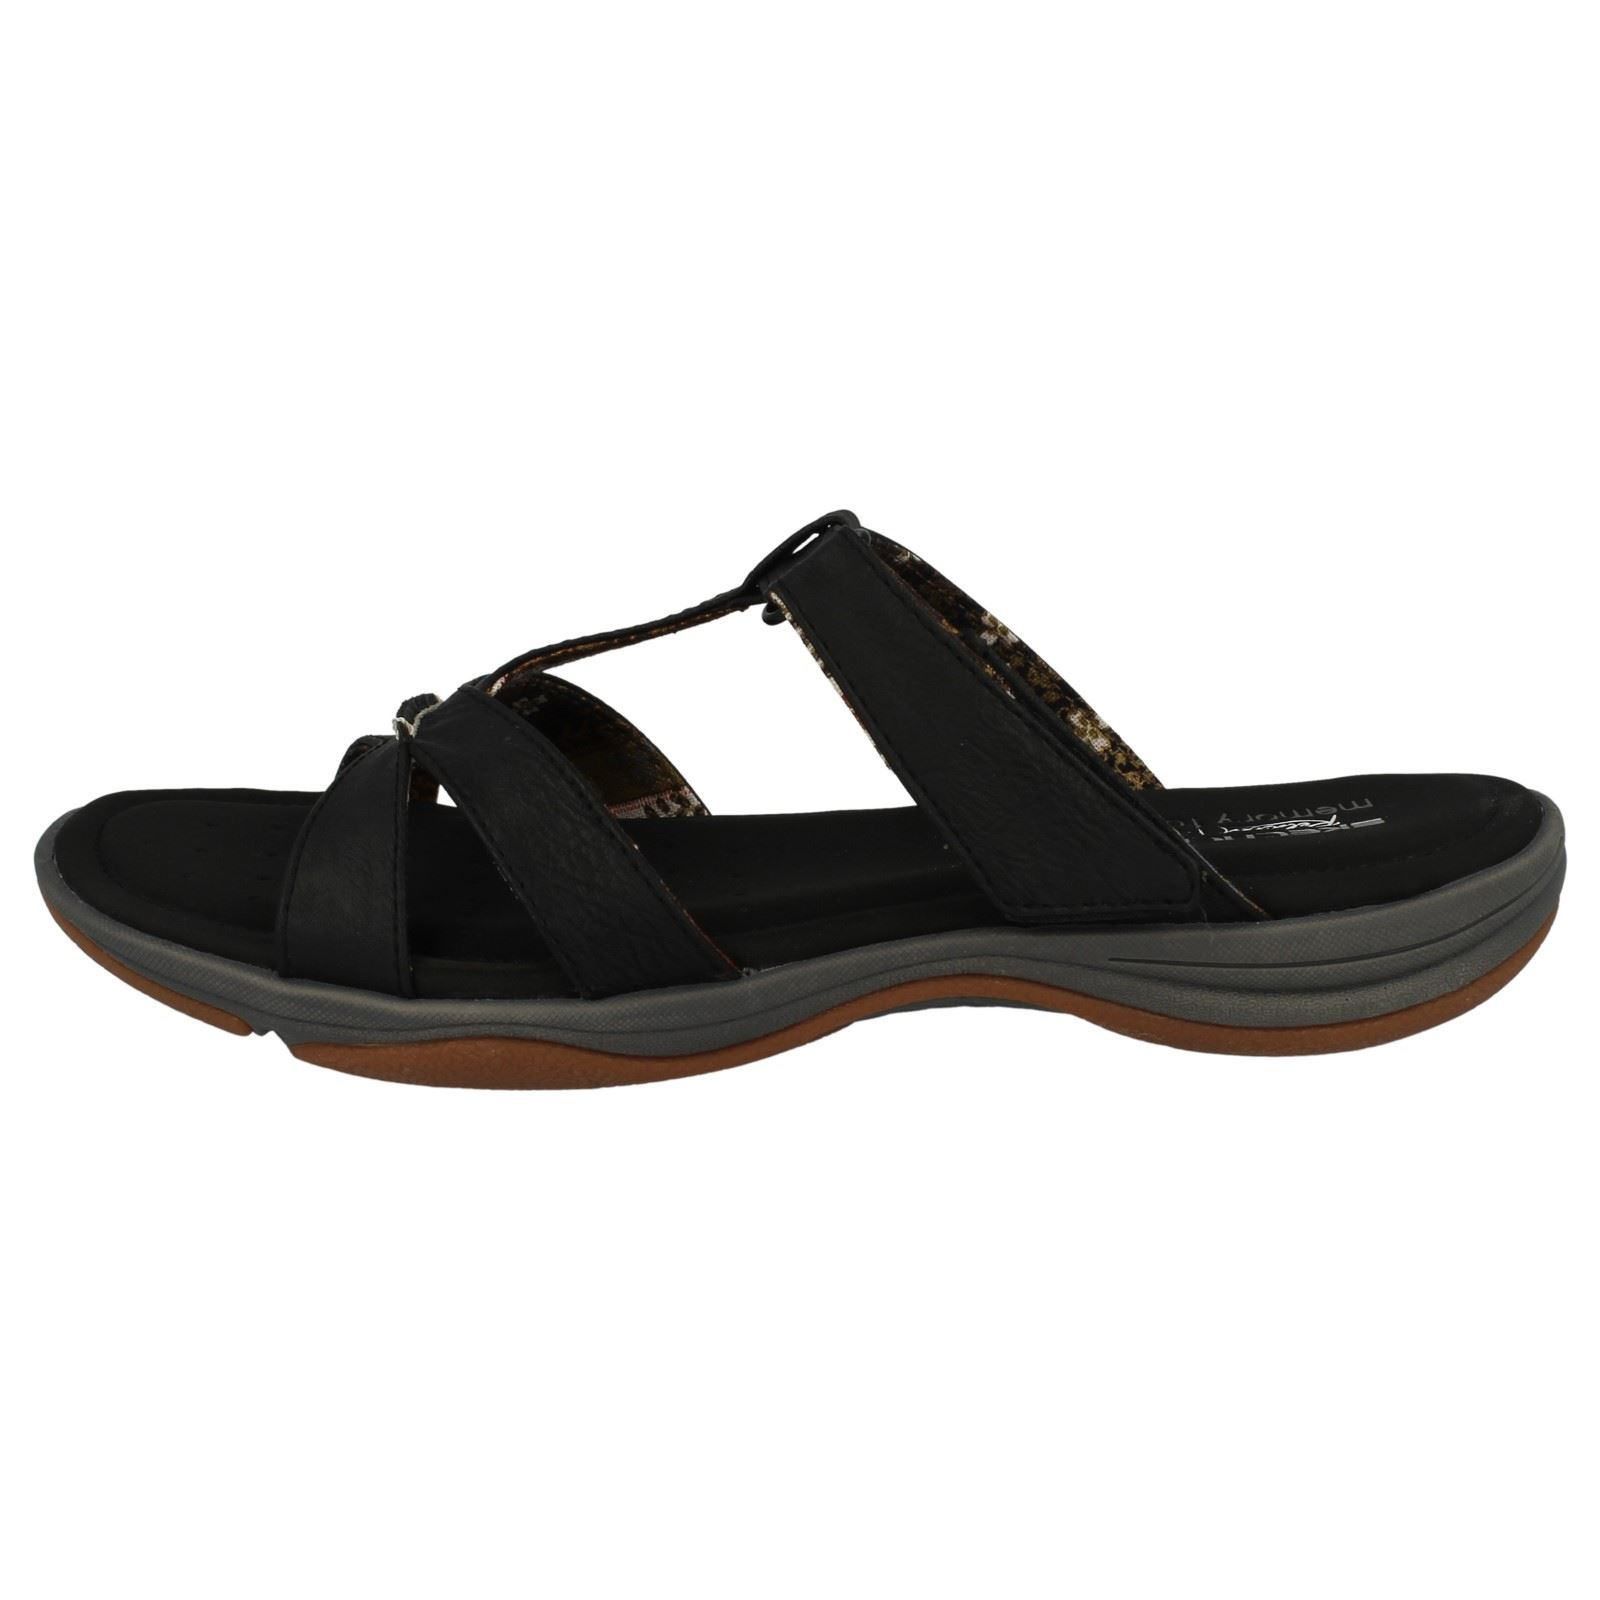 5f890f3127db64 skechers memory foam sandals sale   OFF57% Discounted